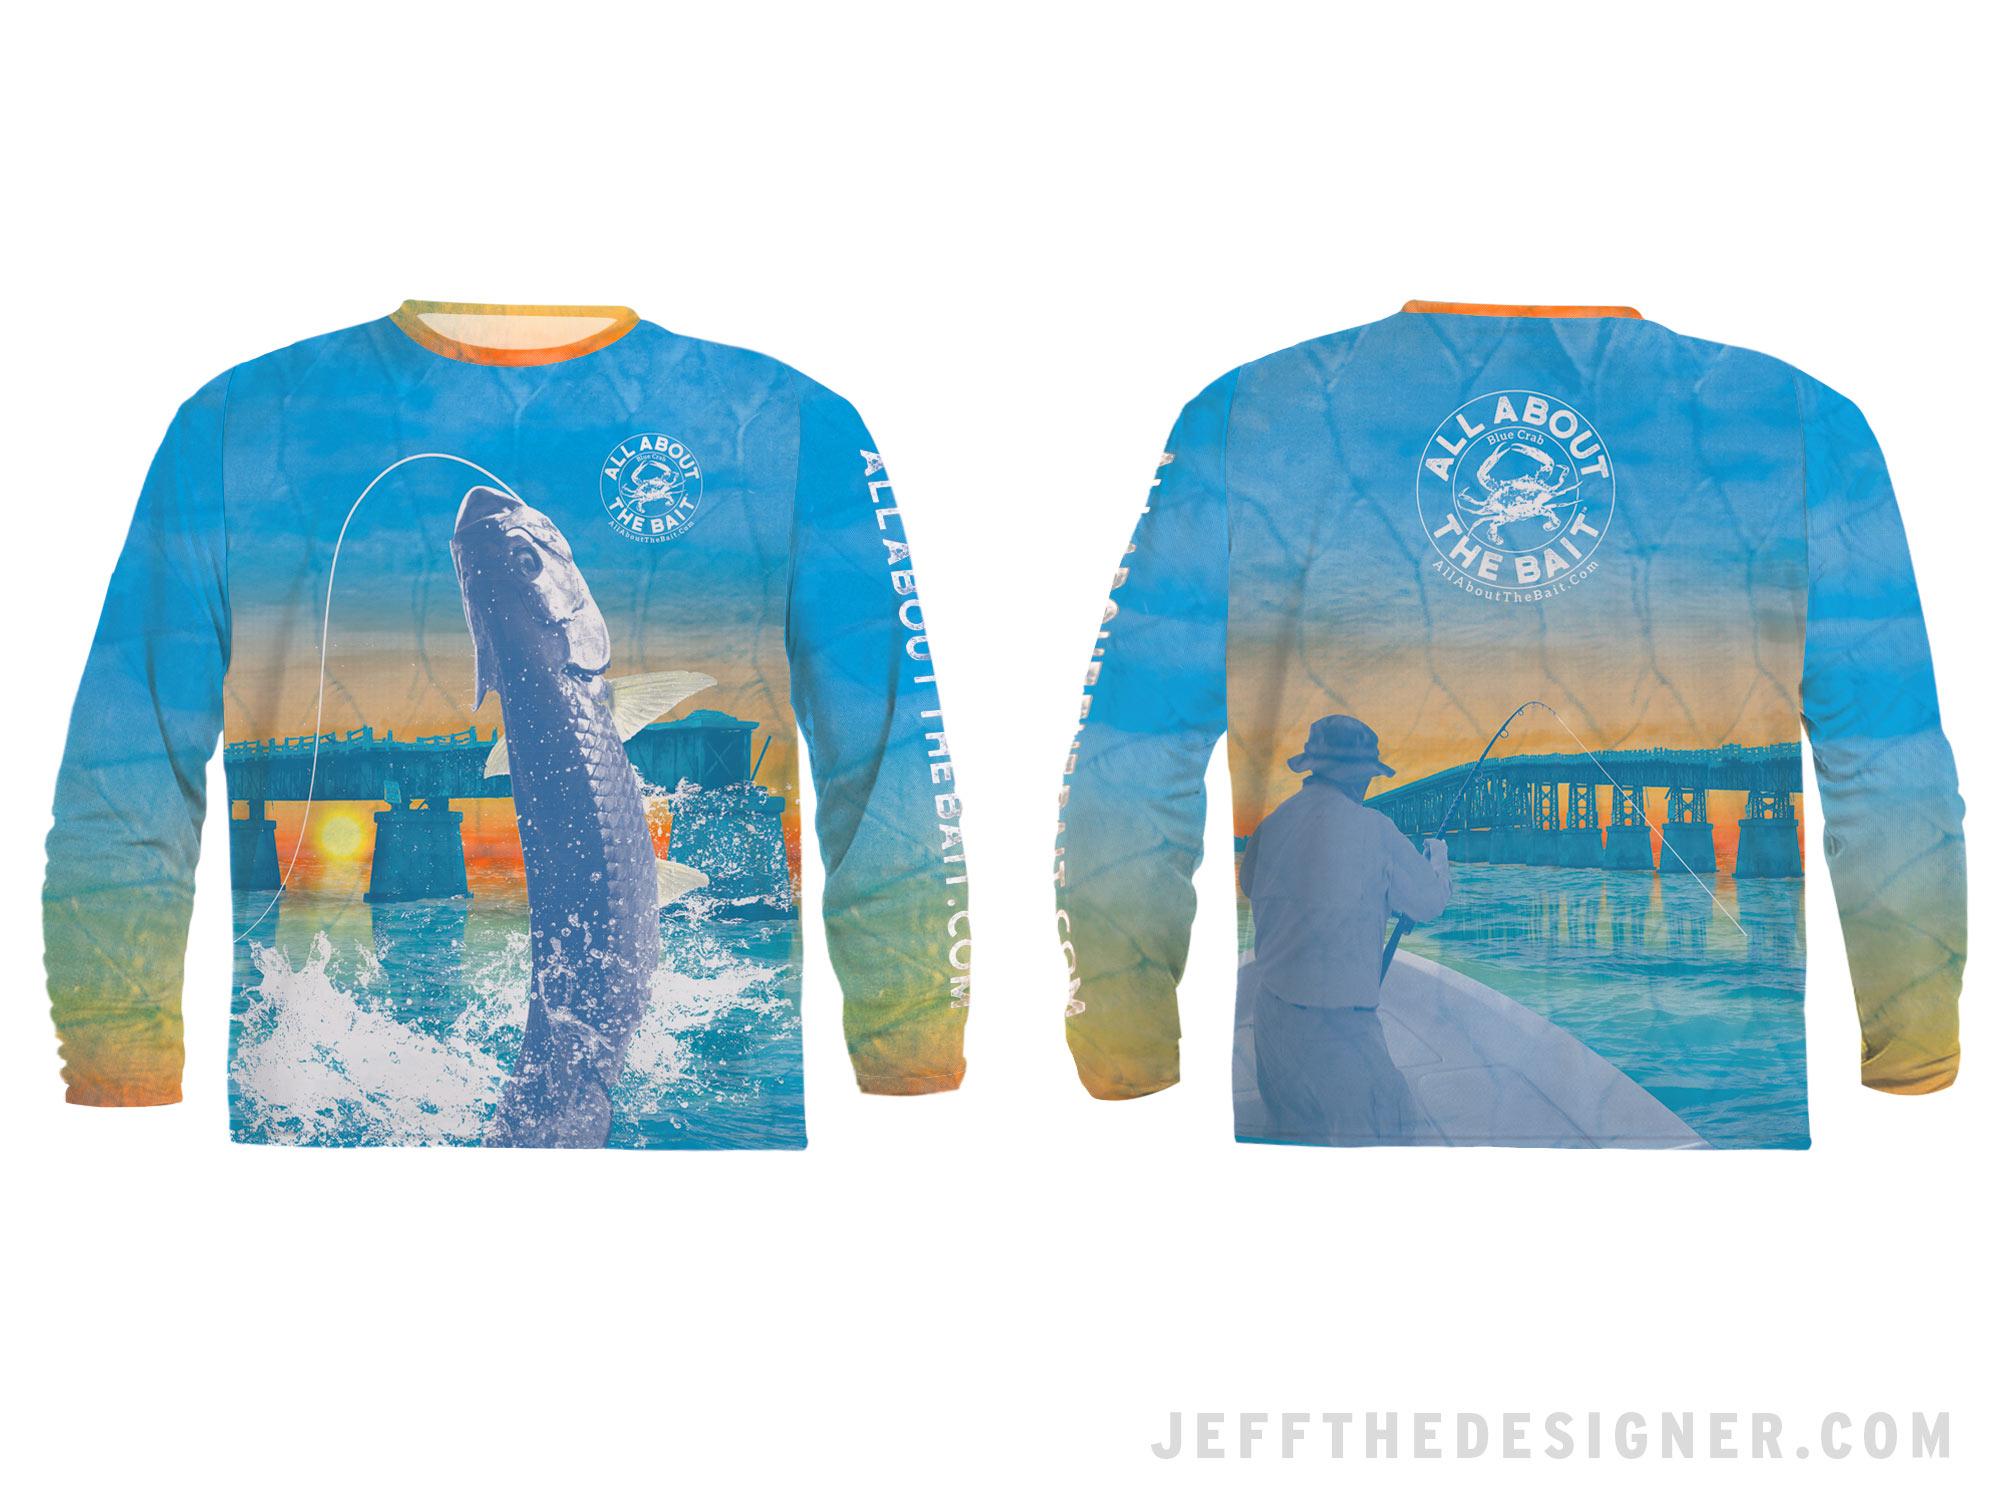 Tarpon Fishing UV Protection Shirt Bahia Honda Florida Keys - jeffthedesigner.com